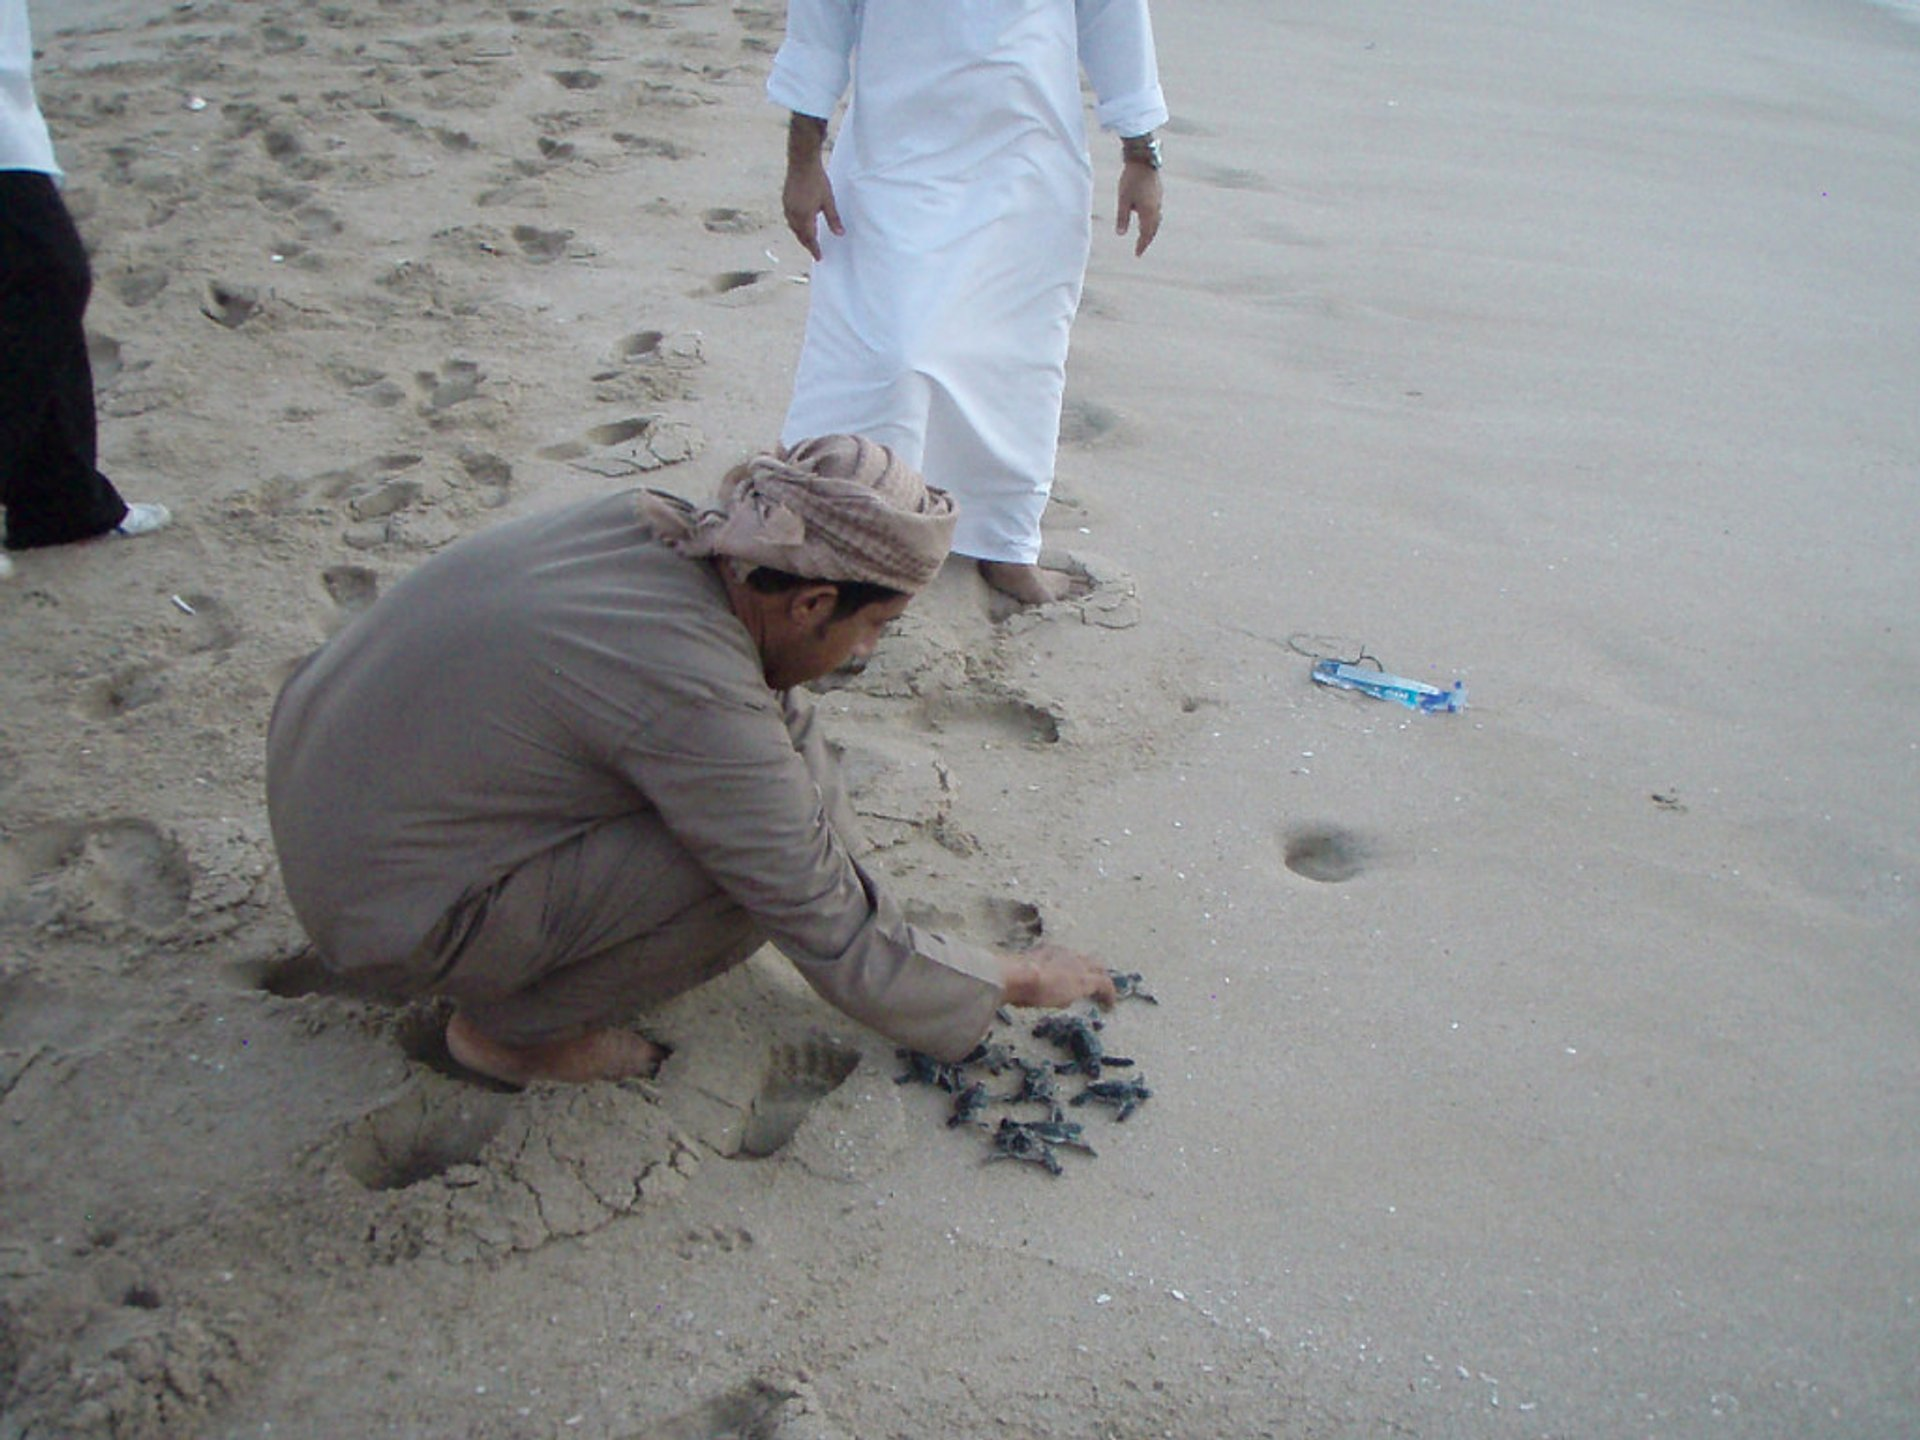 Baby turtles being released at Ras al-Jinz turtle reserve 2020